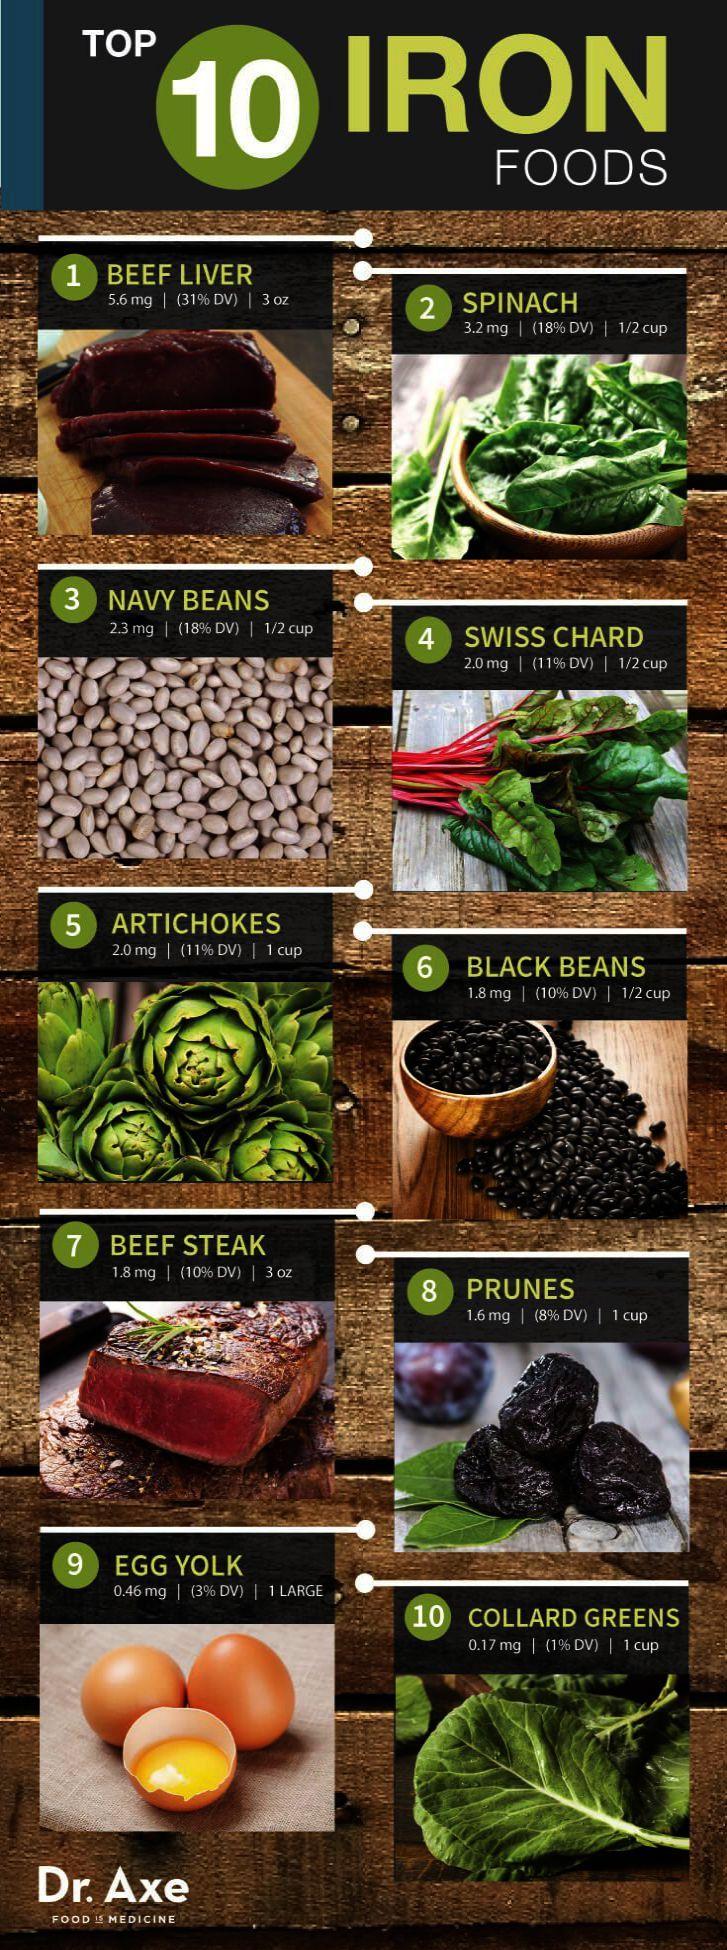 Nutrition Planters Dry Roasted Peanuts versus Nutrition